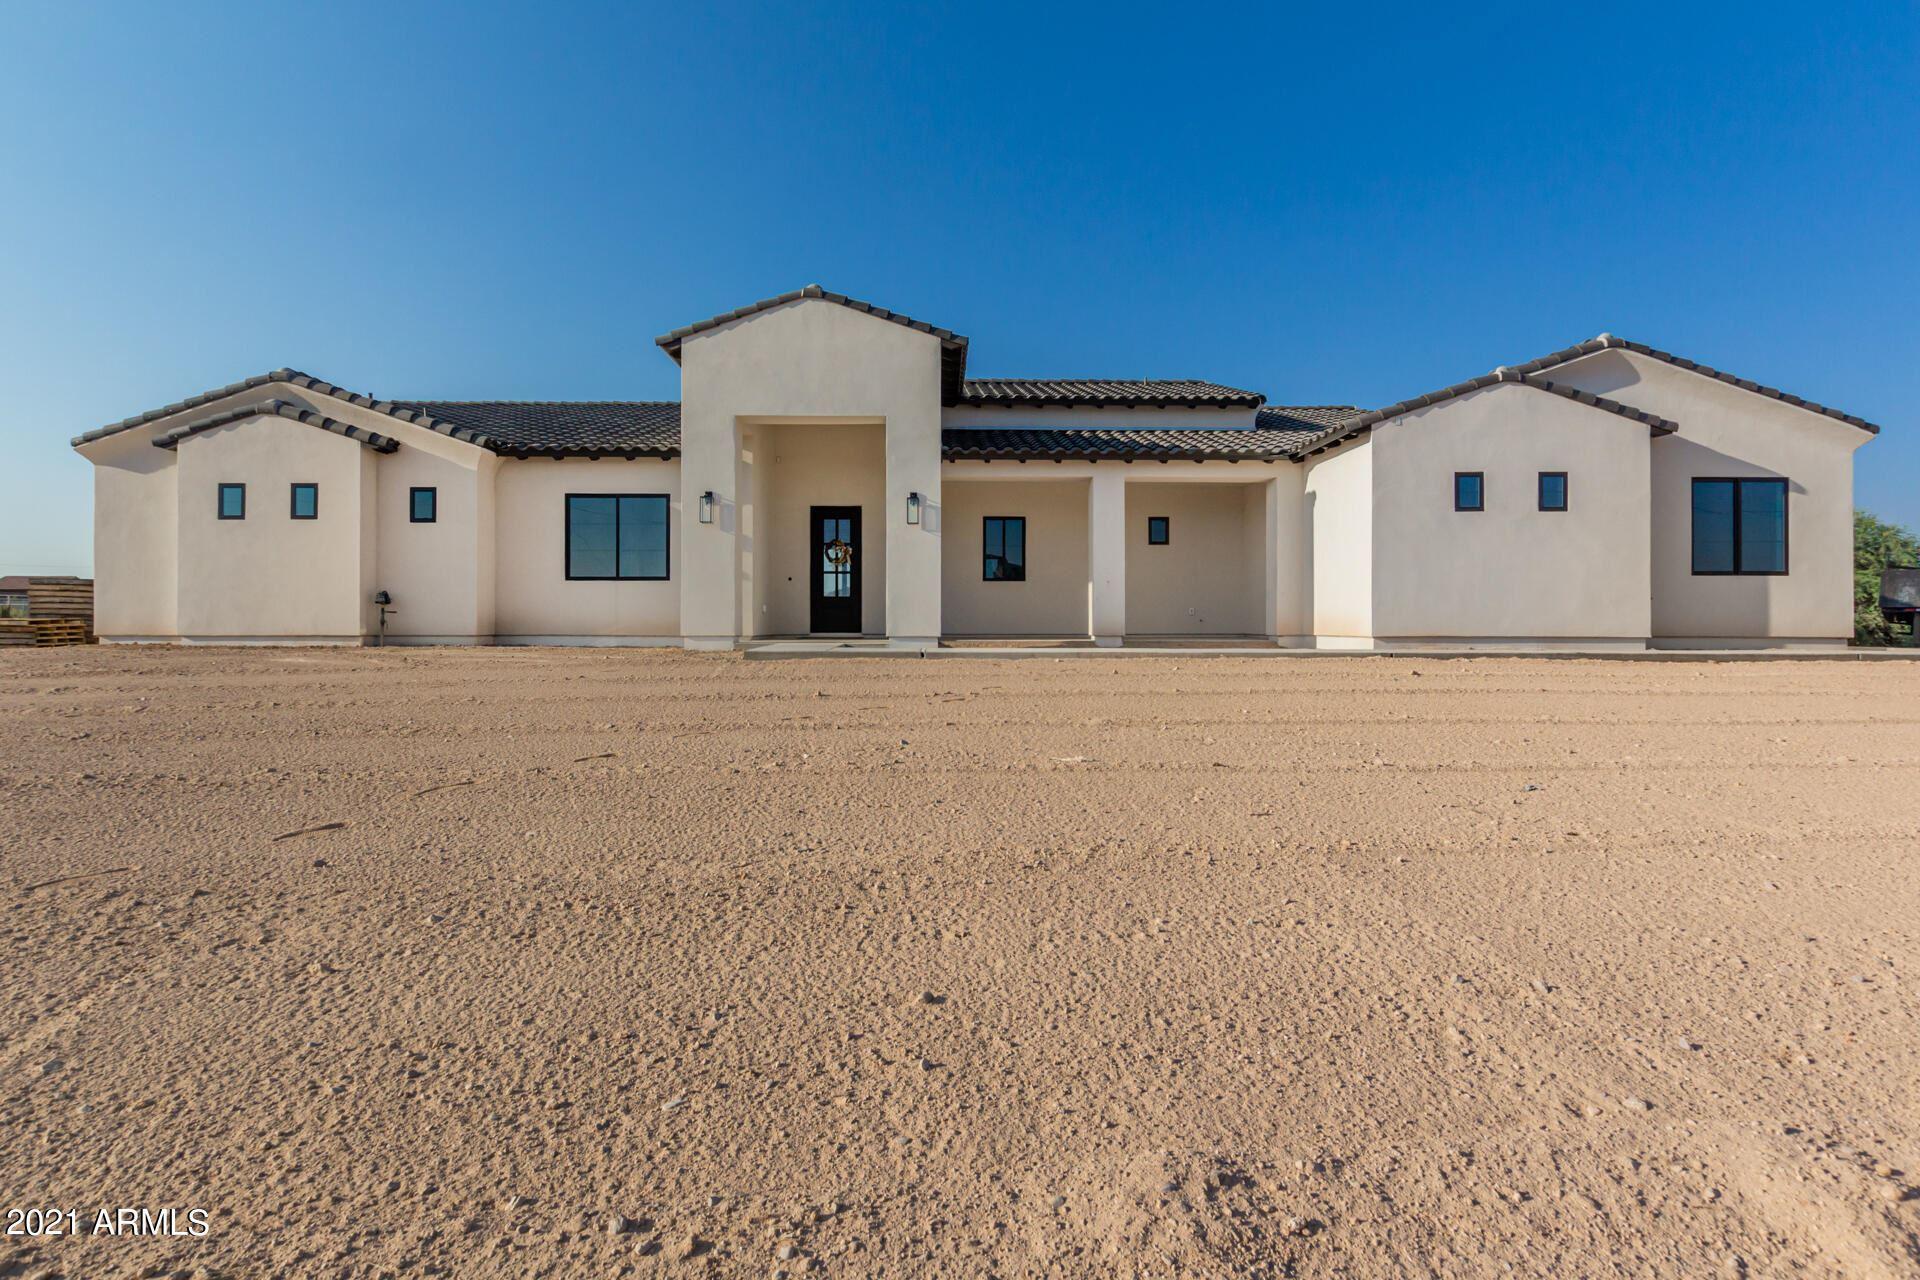 Photo of 748 W RYAN Way, San Tan Valley, AZ 85143 (MLS # 6295502)